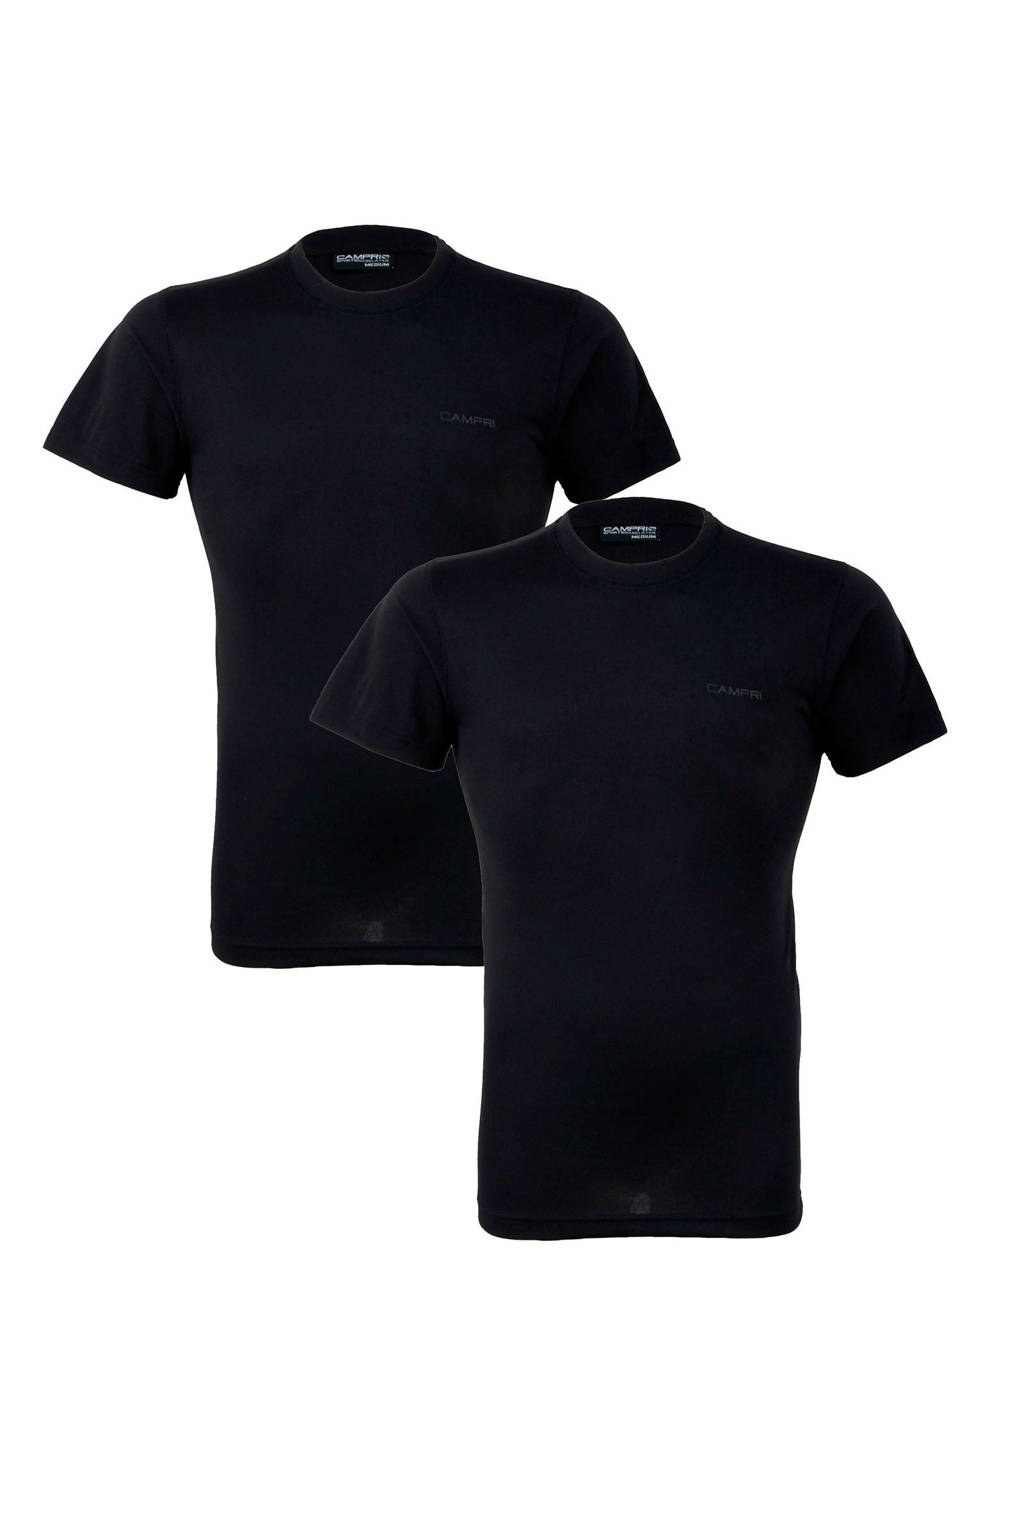 Campri thermo T-shirt (set van 2) zwart, Zwart